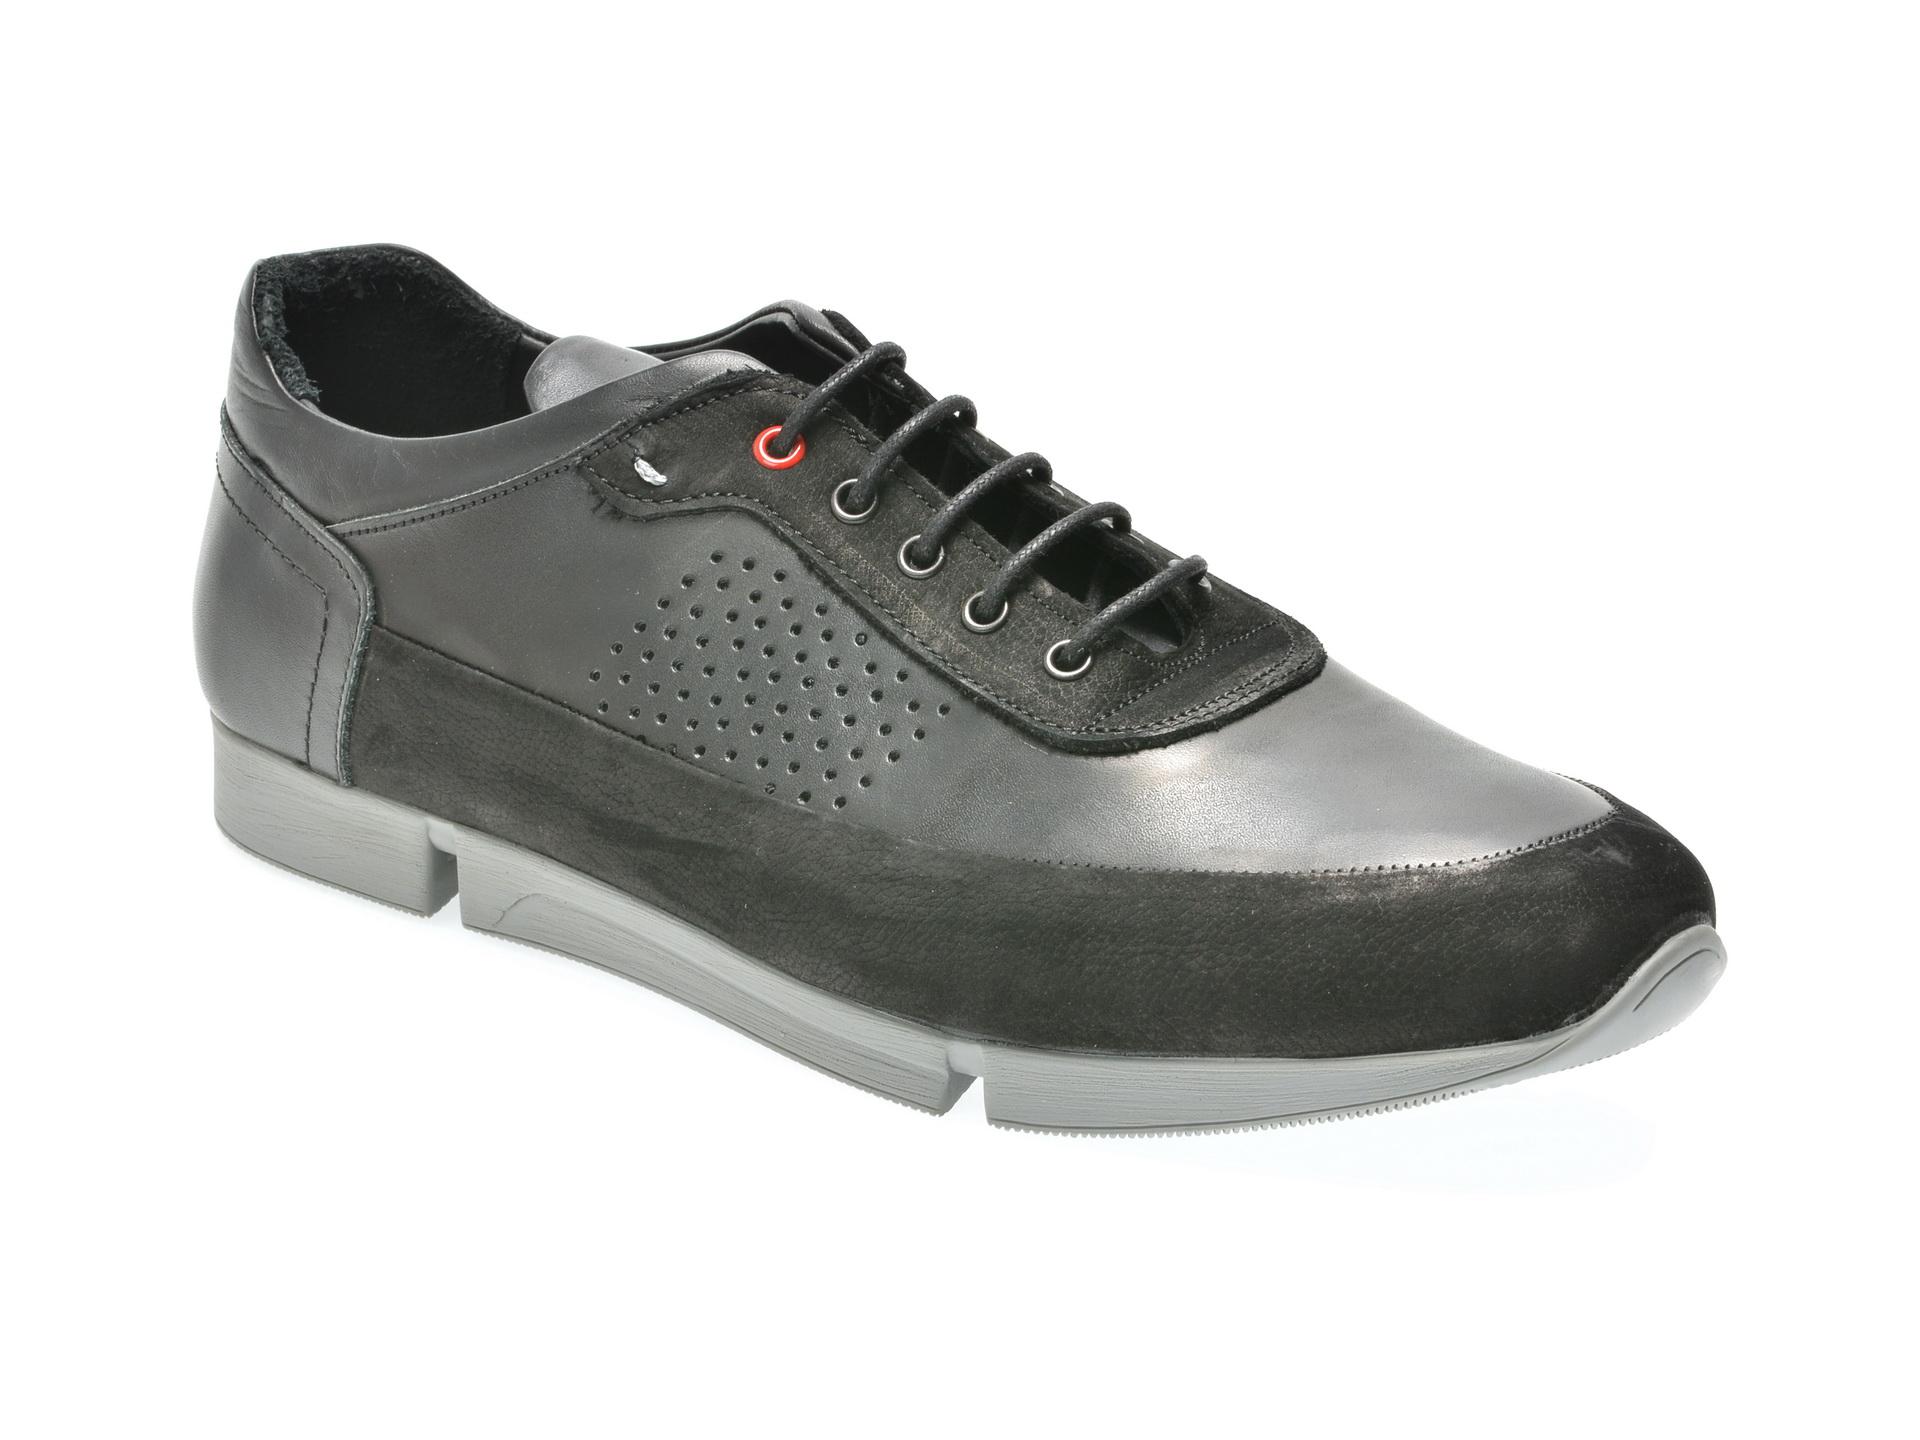 Pantofi OTTER negri, M4557, din piele naturala